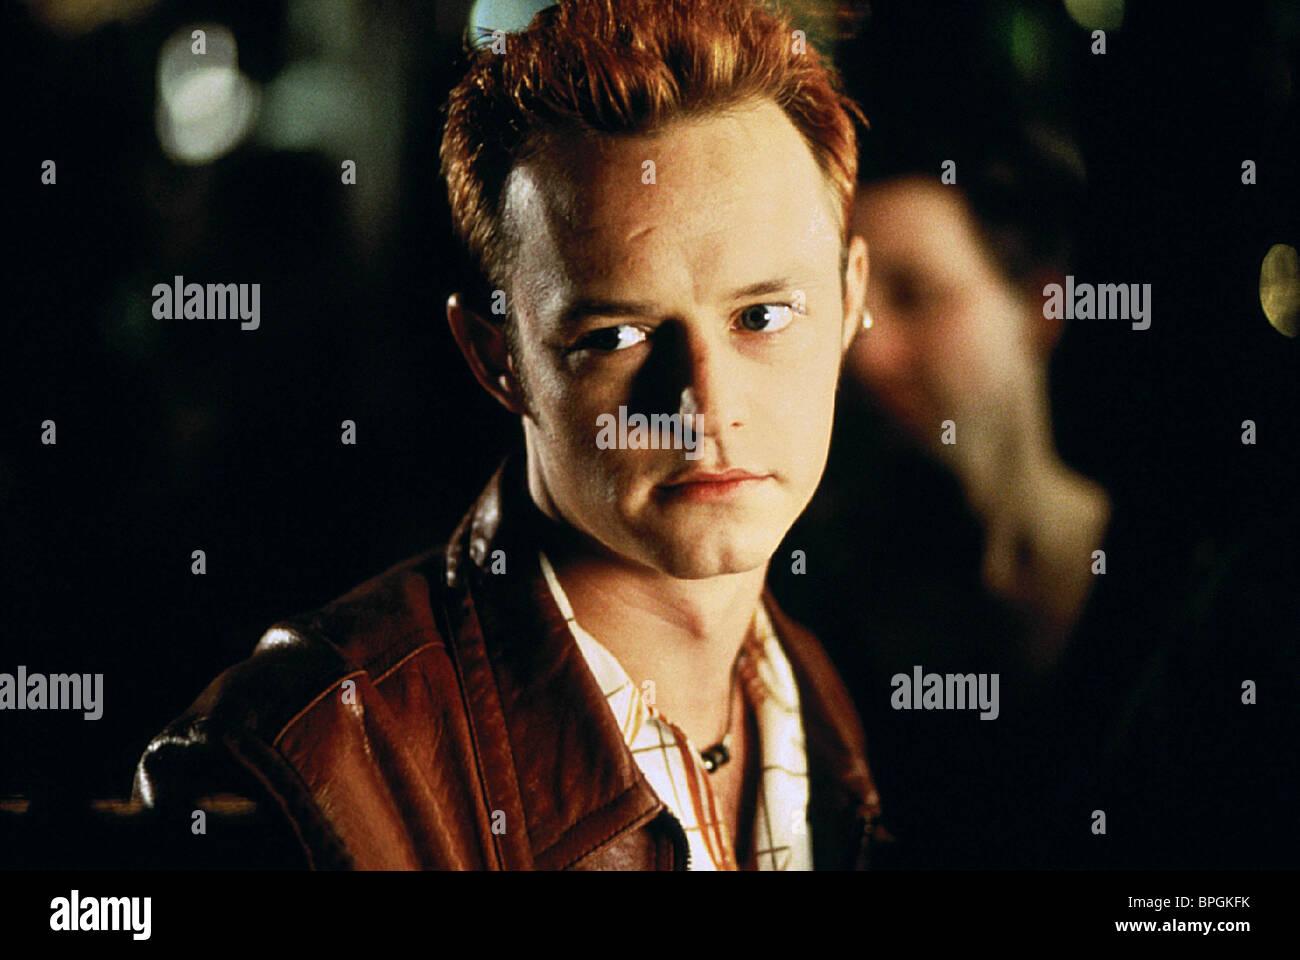 DESMOND ASKEW GO (1999) - Stock Image